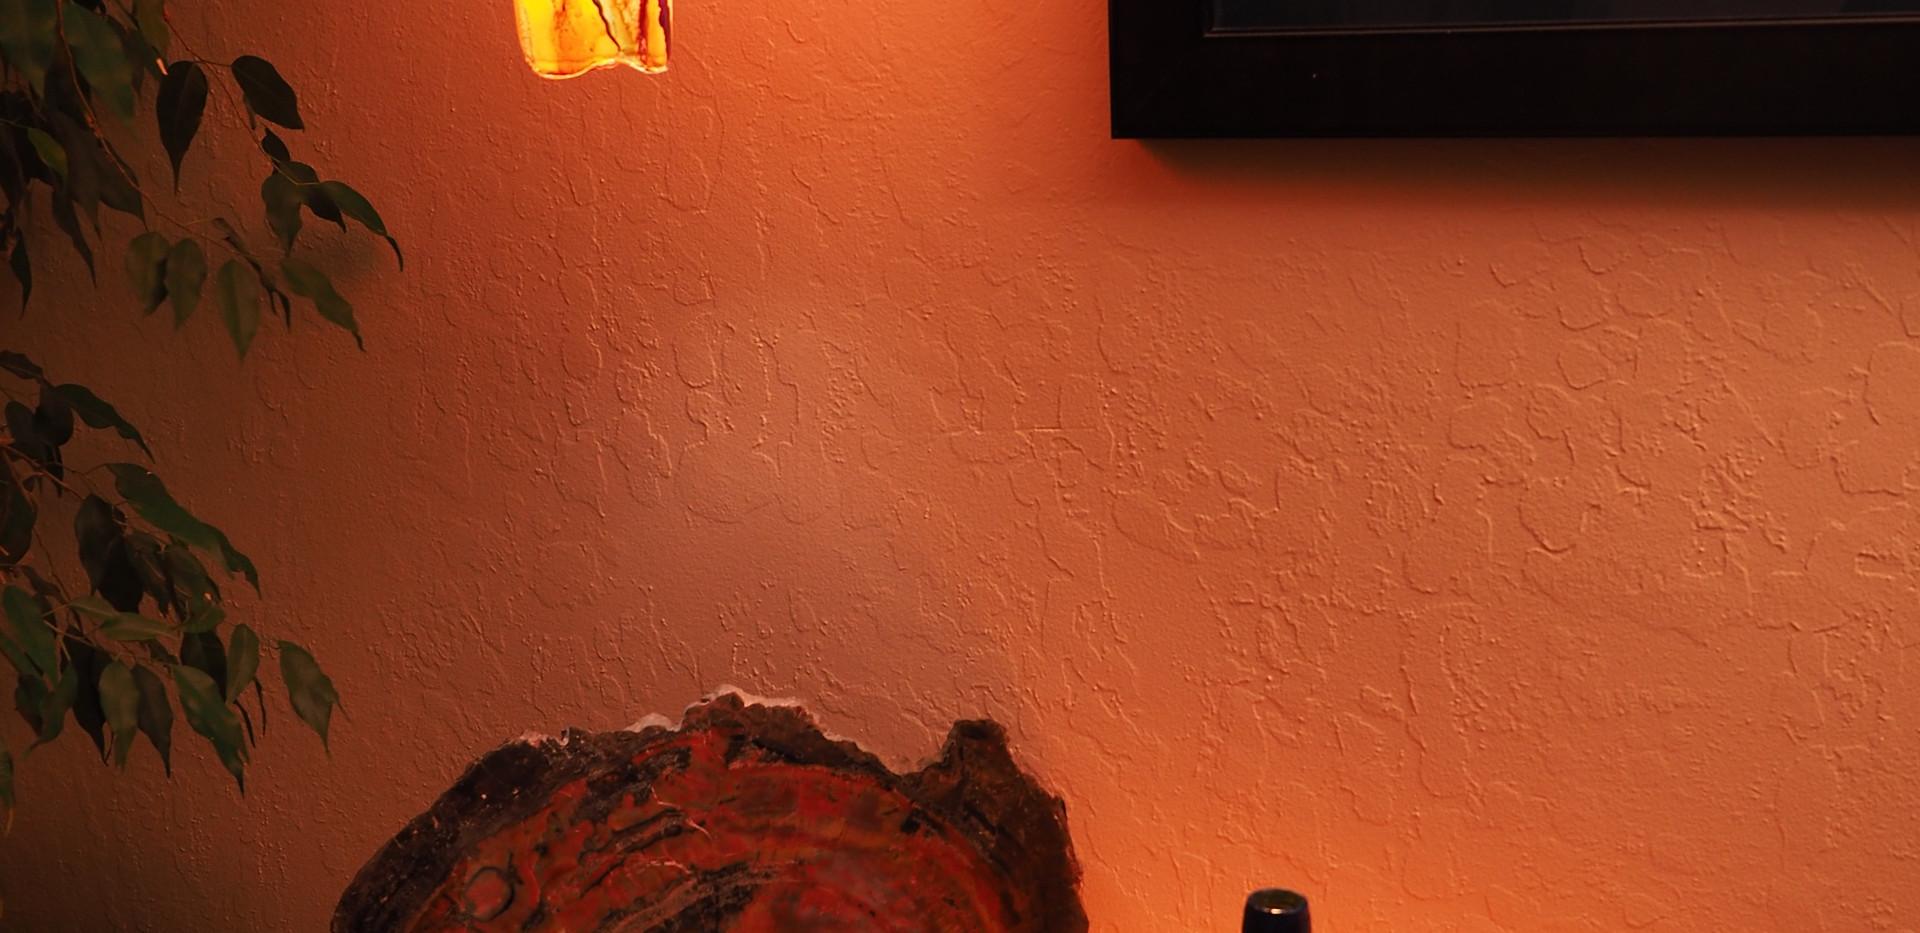 Blue-Orange bottle lamp set